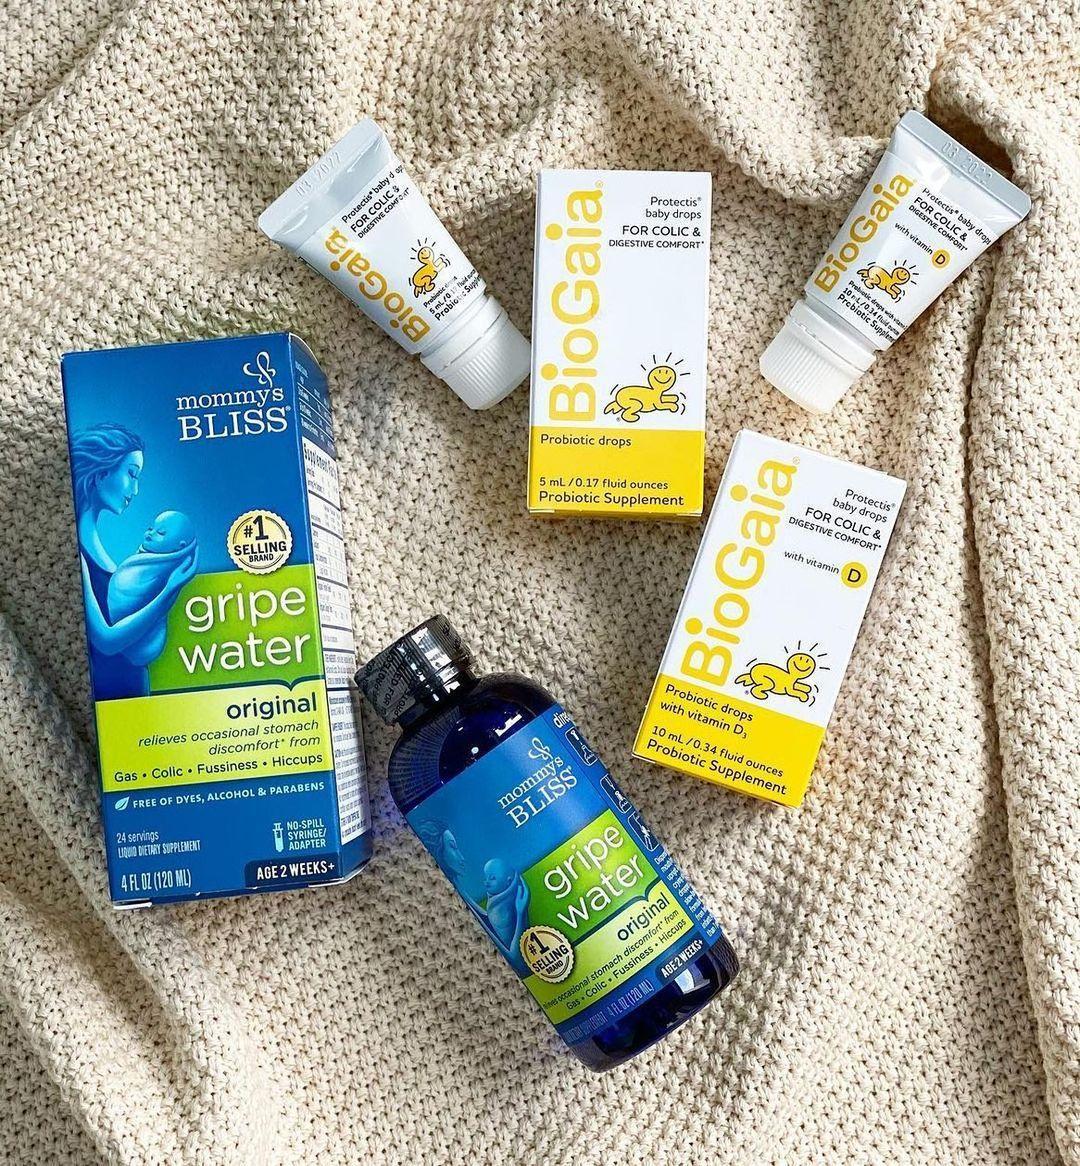 Probiotic Supplement BioGaia, Пробиотик с Витамином D3,10mg